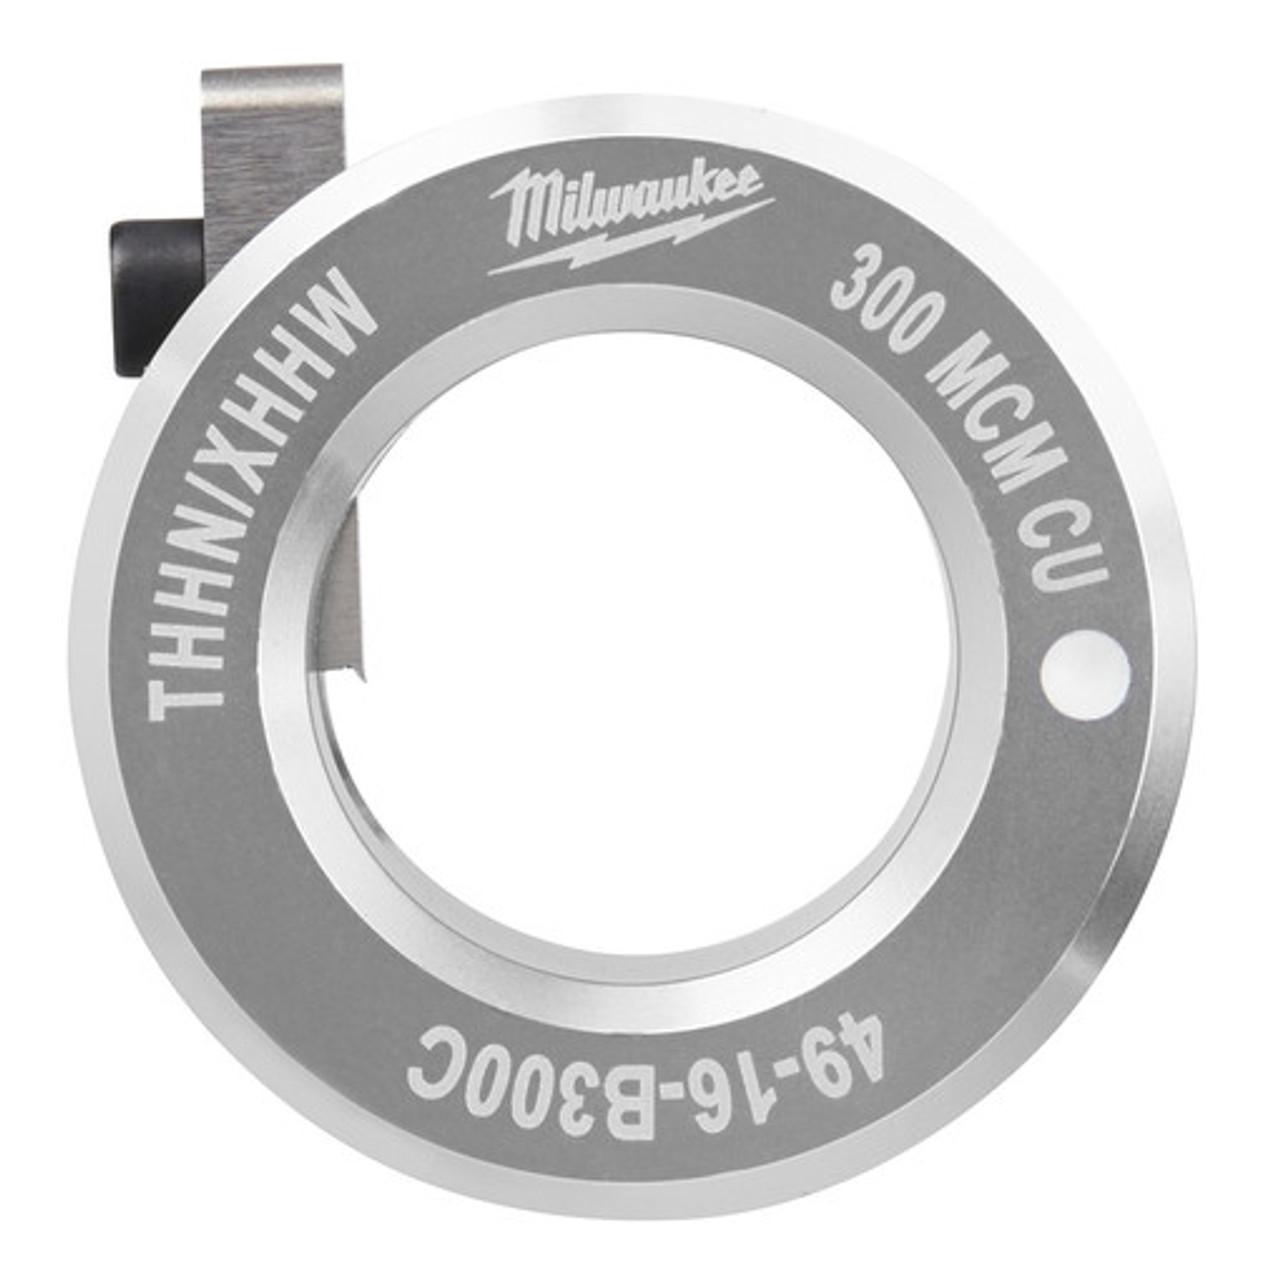 Milwaukee 49-16-B300C 300 MCM Cu THHN/ XHHW Bushing